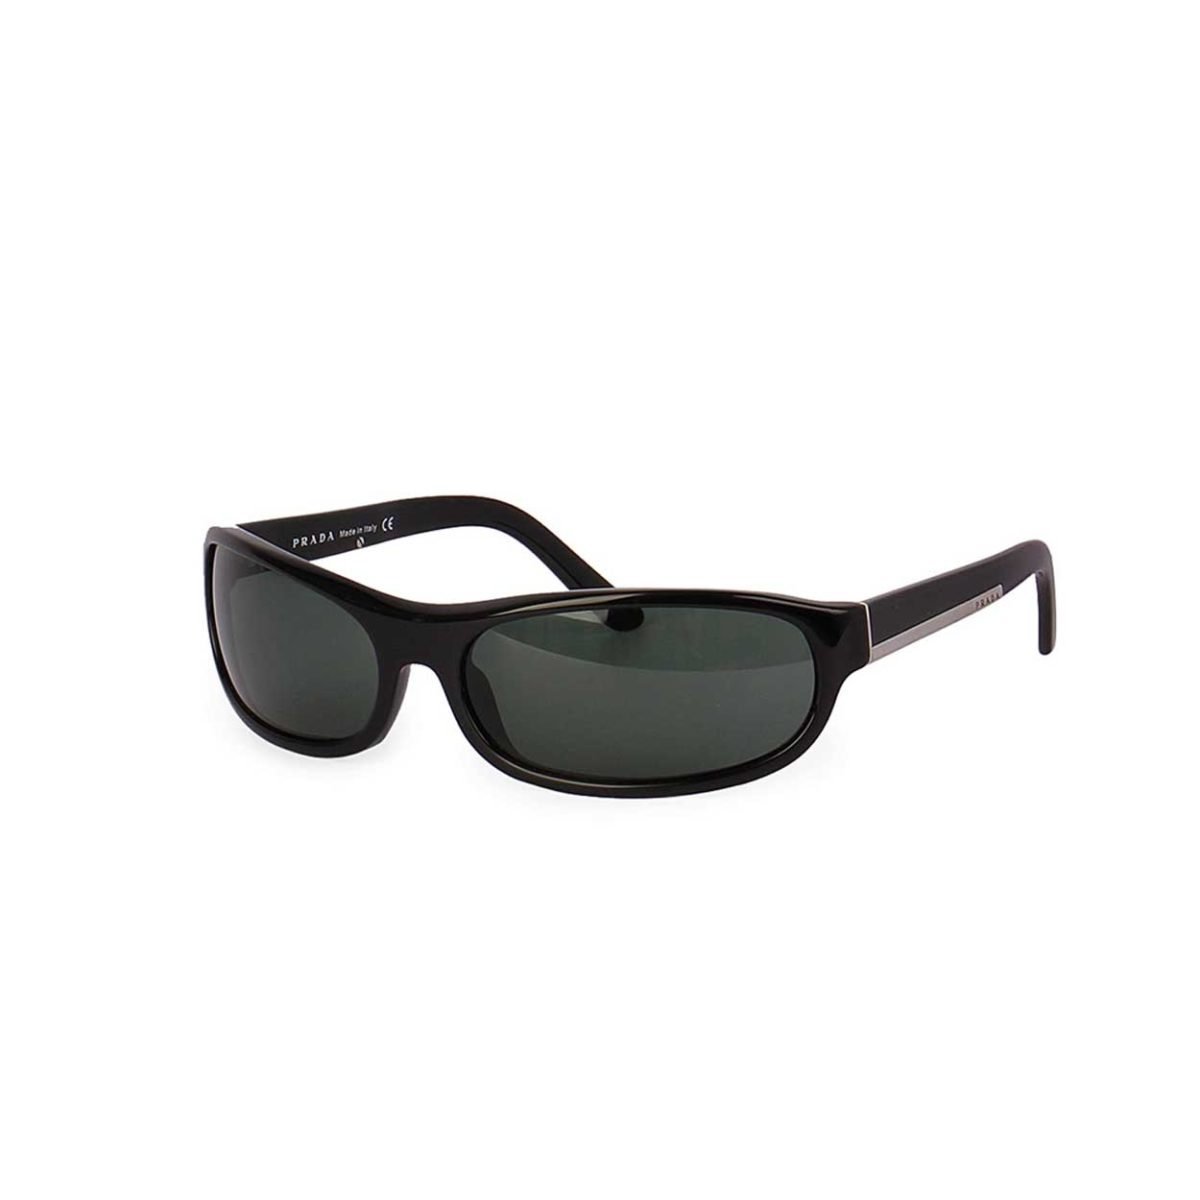 4a2d8f5b01 Prada Black Sunglasses